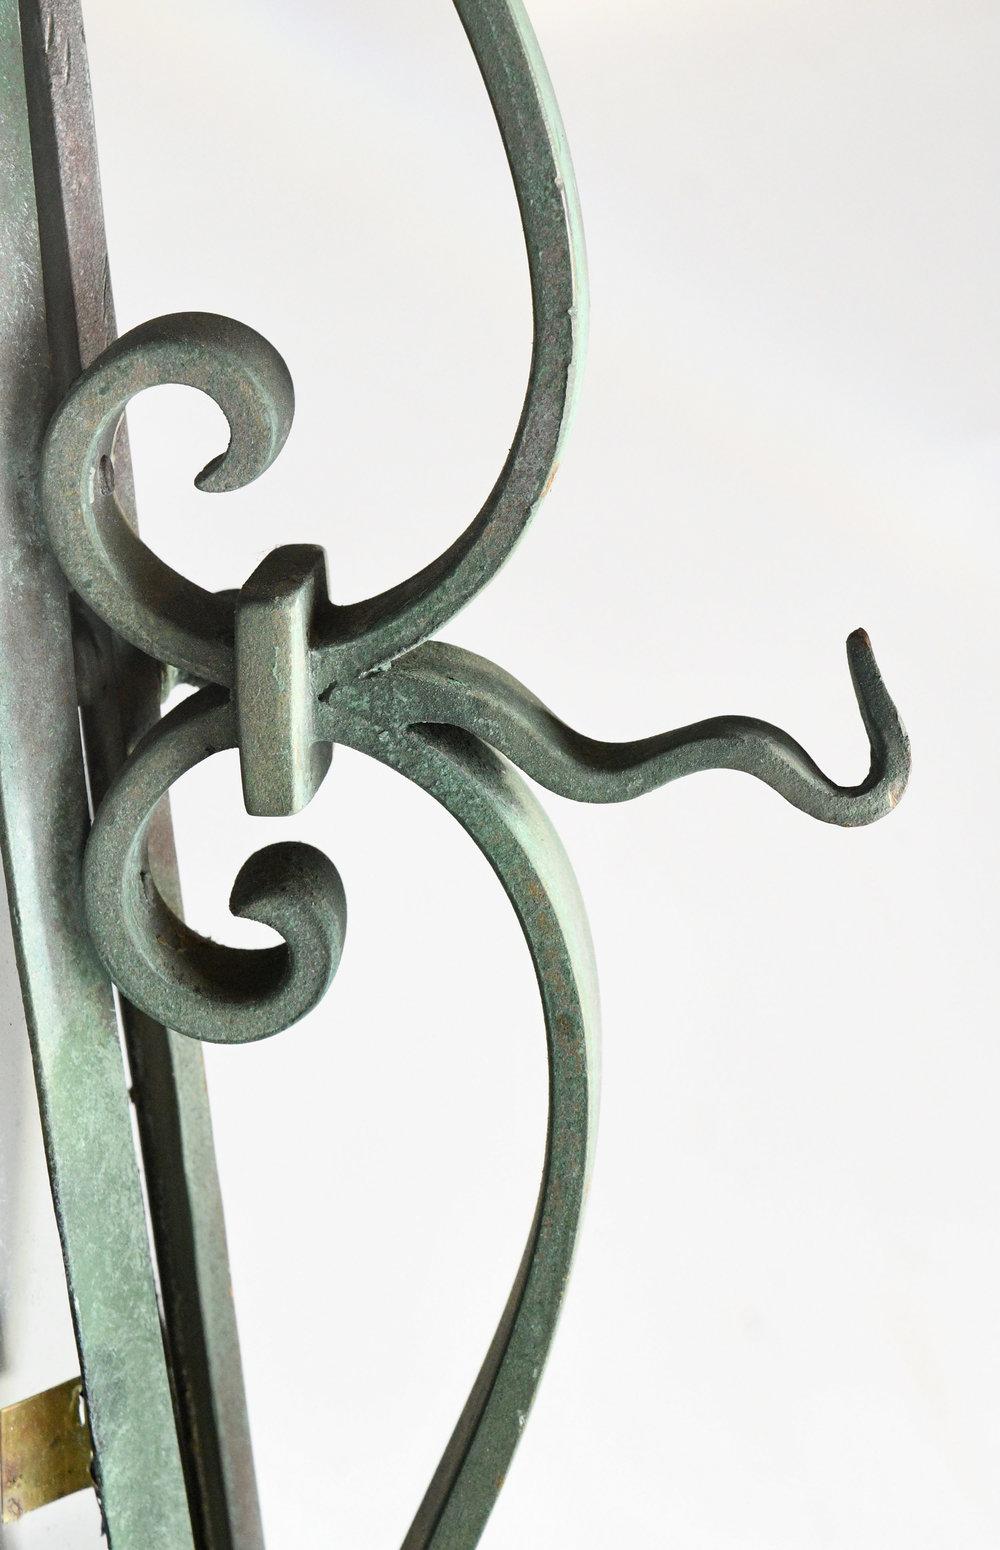 47246-victorian-copper-iron-sconce-swirly-design.jpg